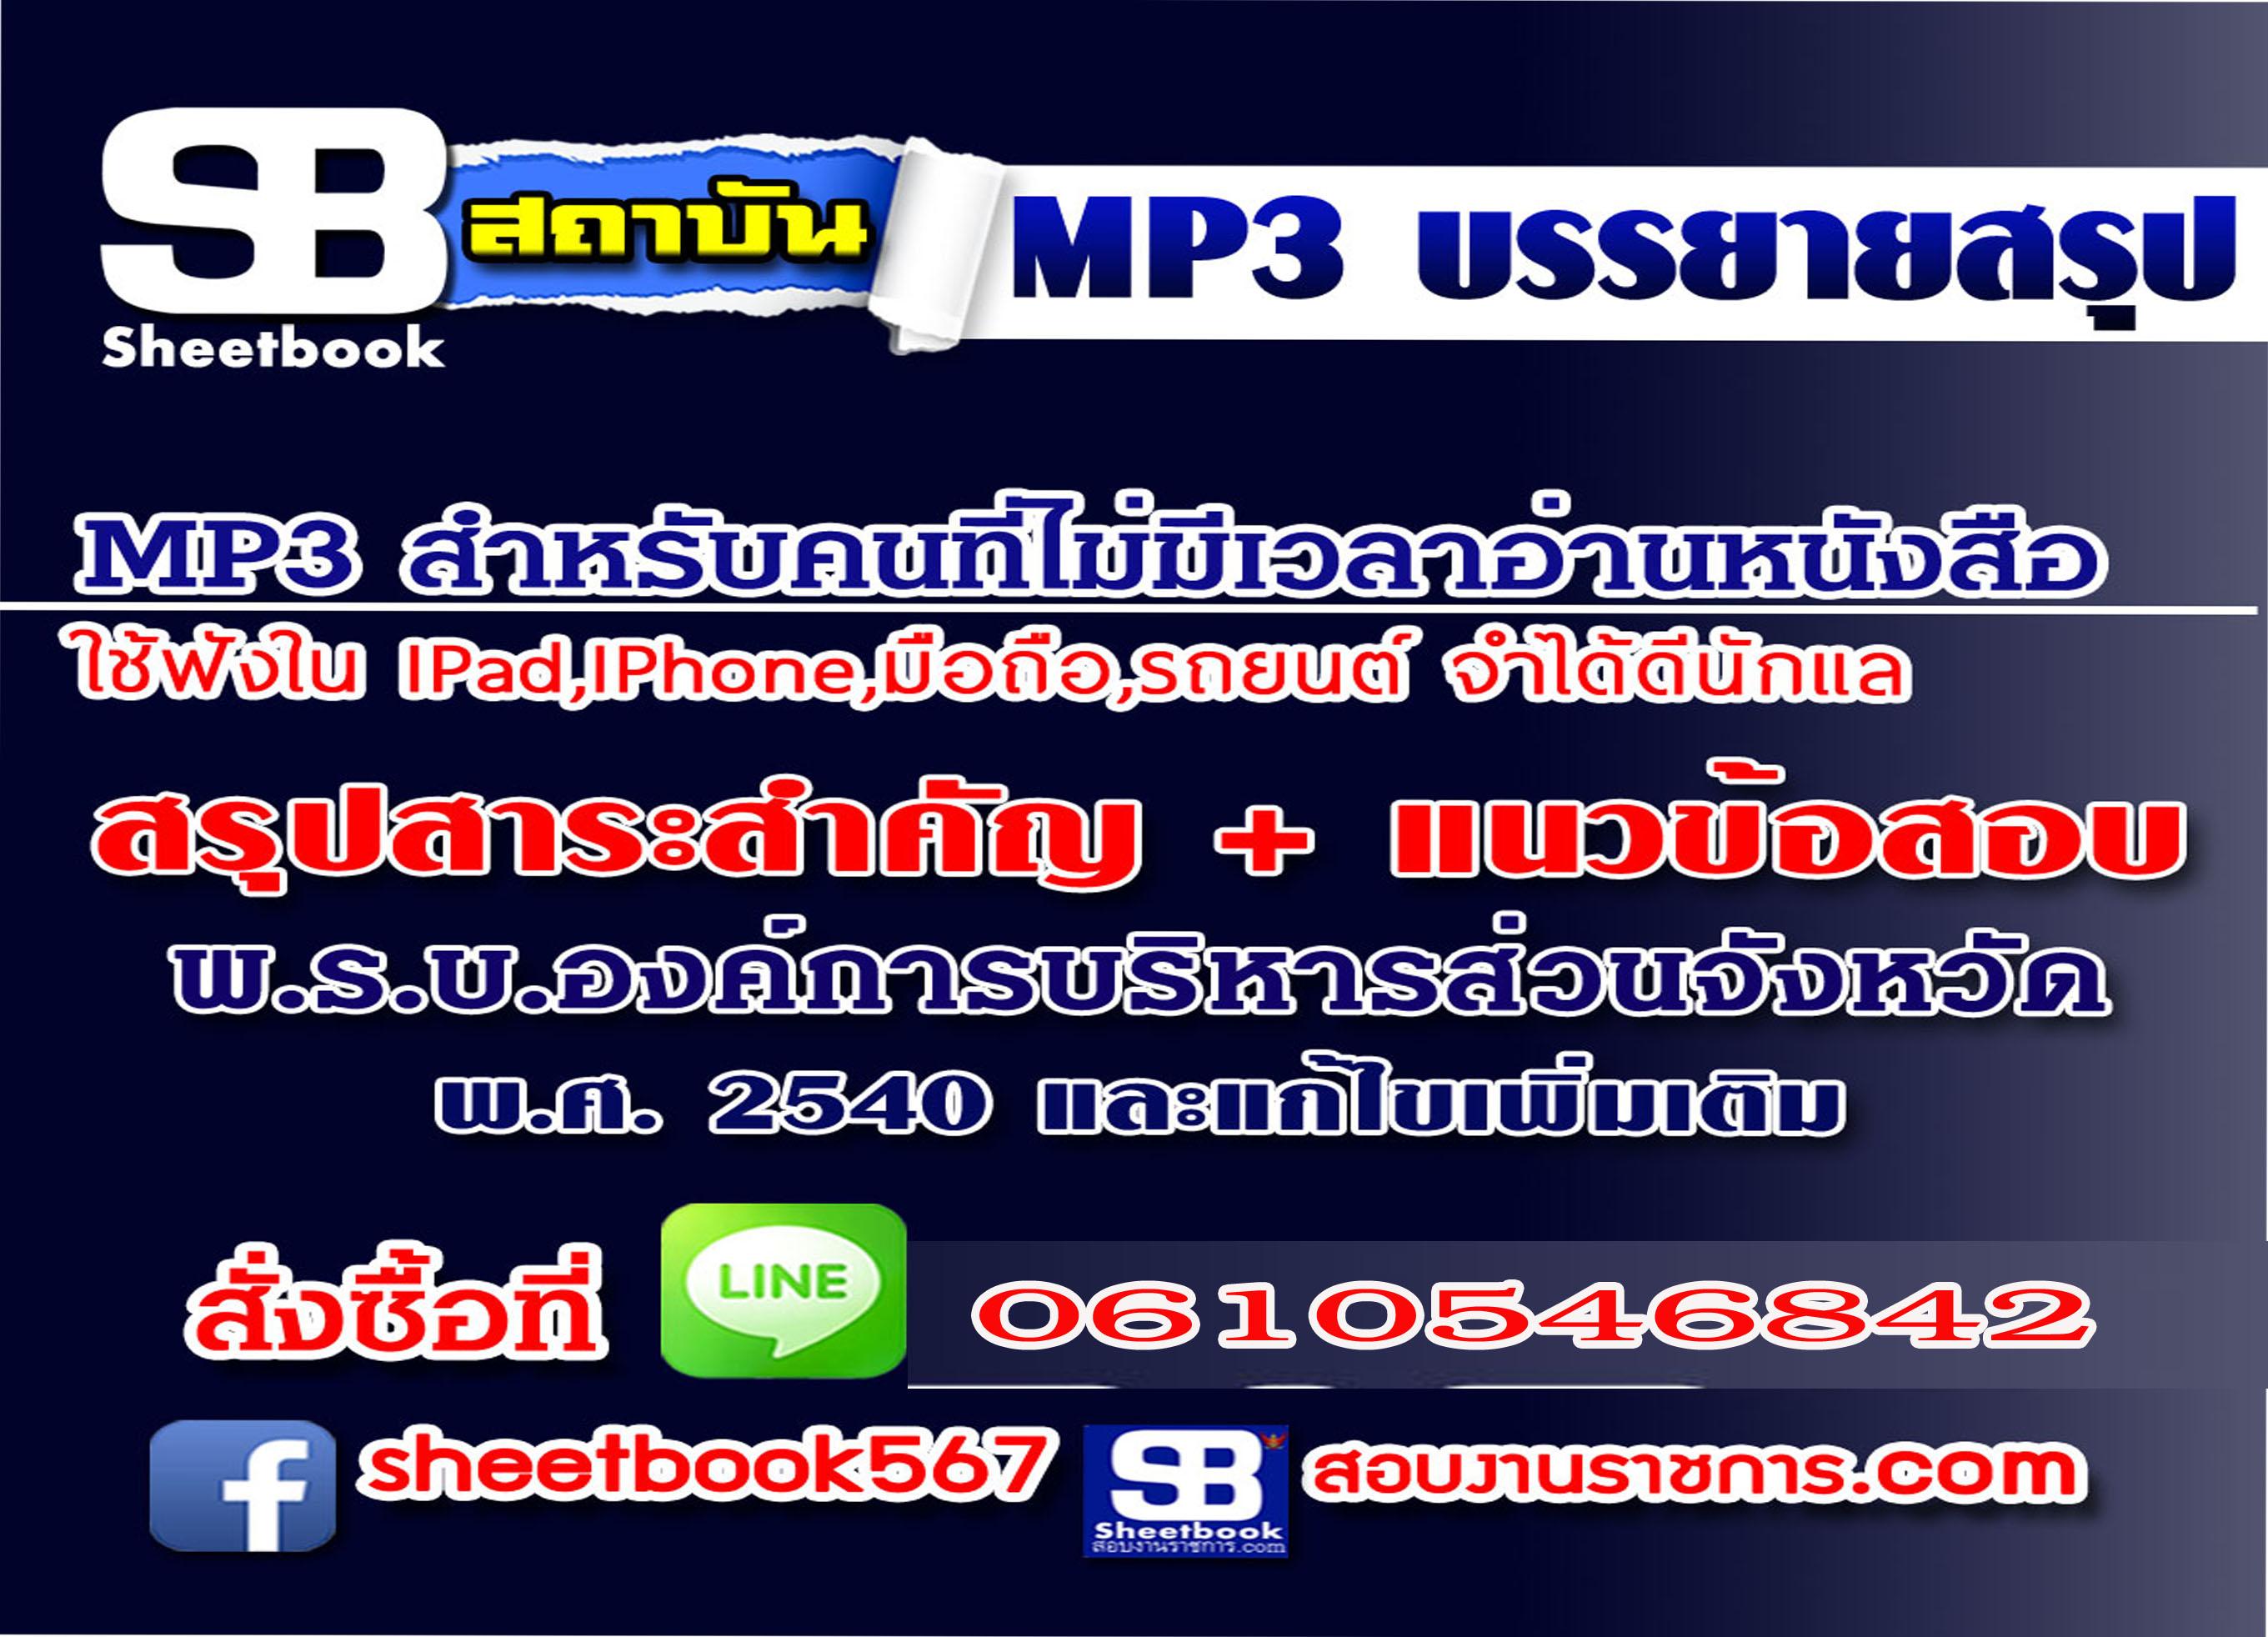 P026 - สาระสำคัญ+แนวข้อสอบพระราชบัญญัติองค์การบริหารส่วนจังหวัด พ.ศ.2540 และแก้ไขเพิ่ม